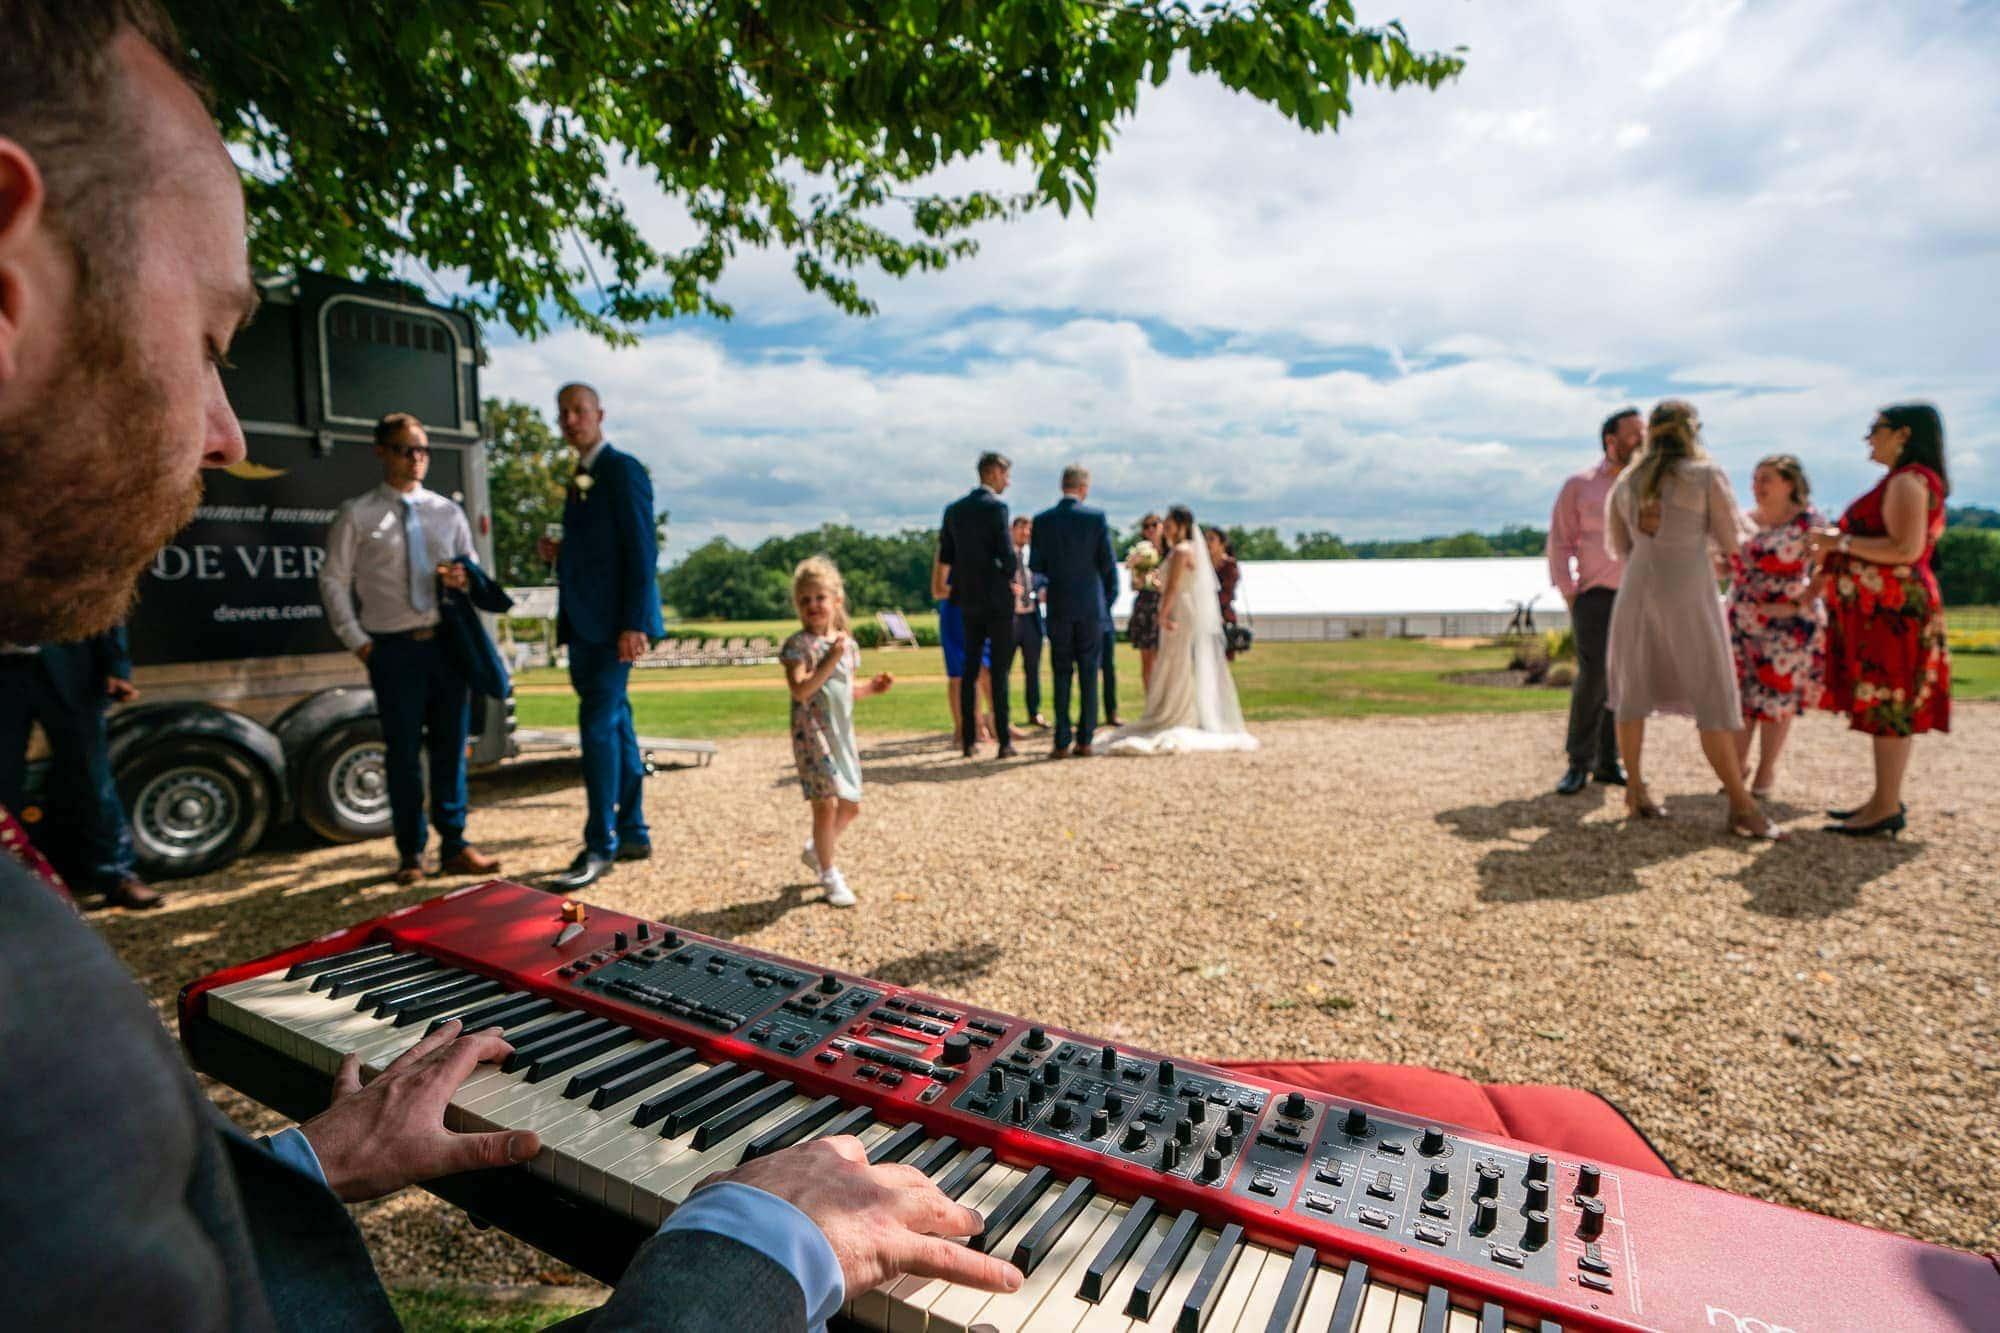 Wedding Reception outdoors at De Vere Wokefiled Estate